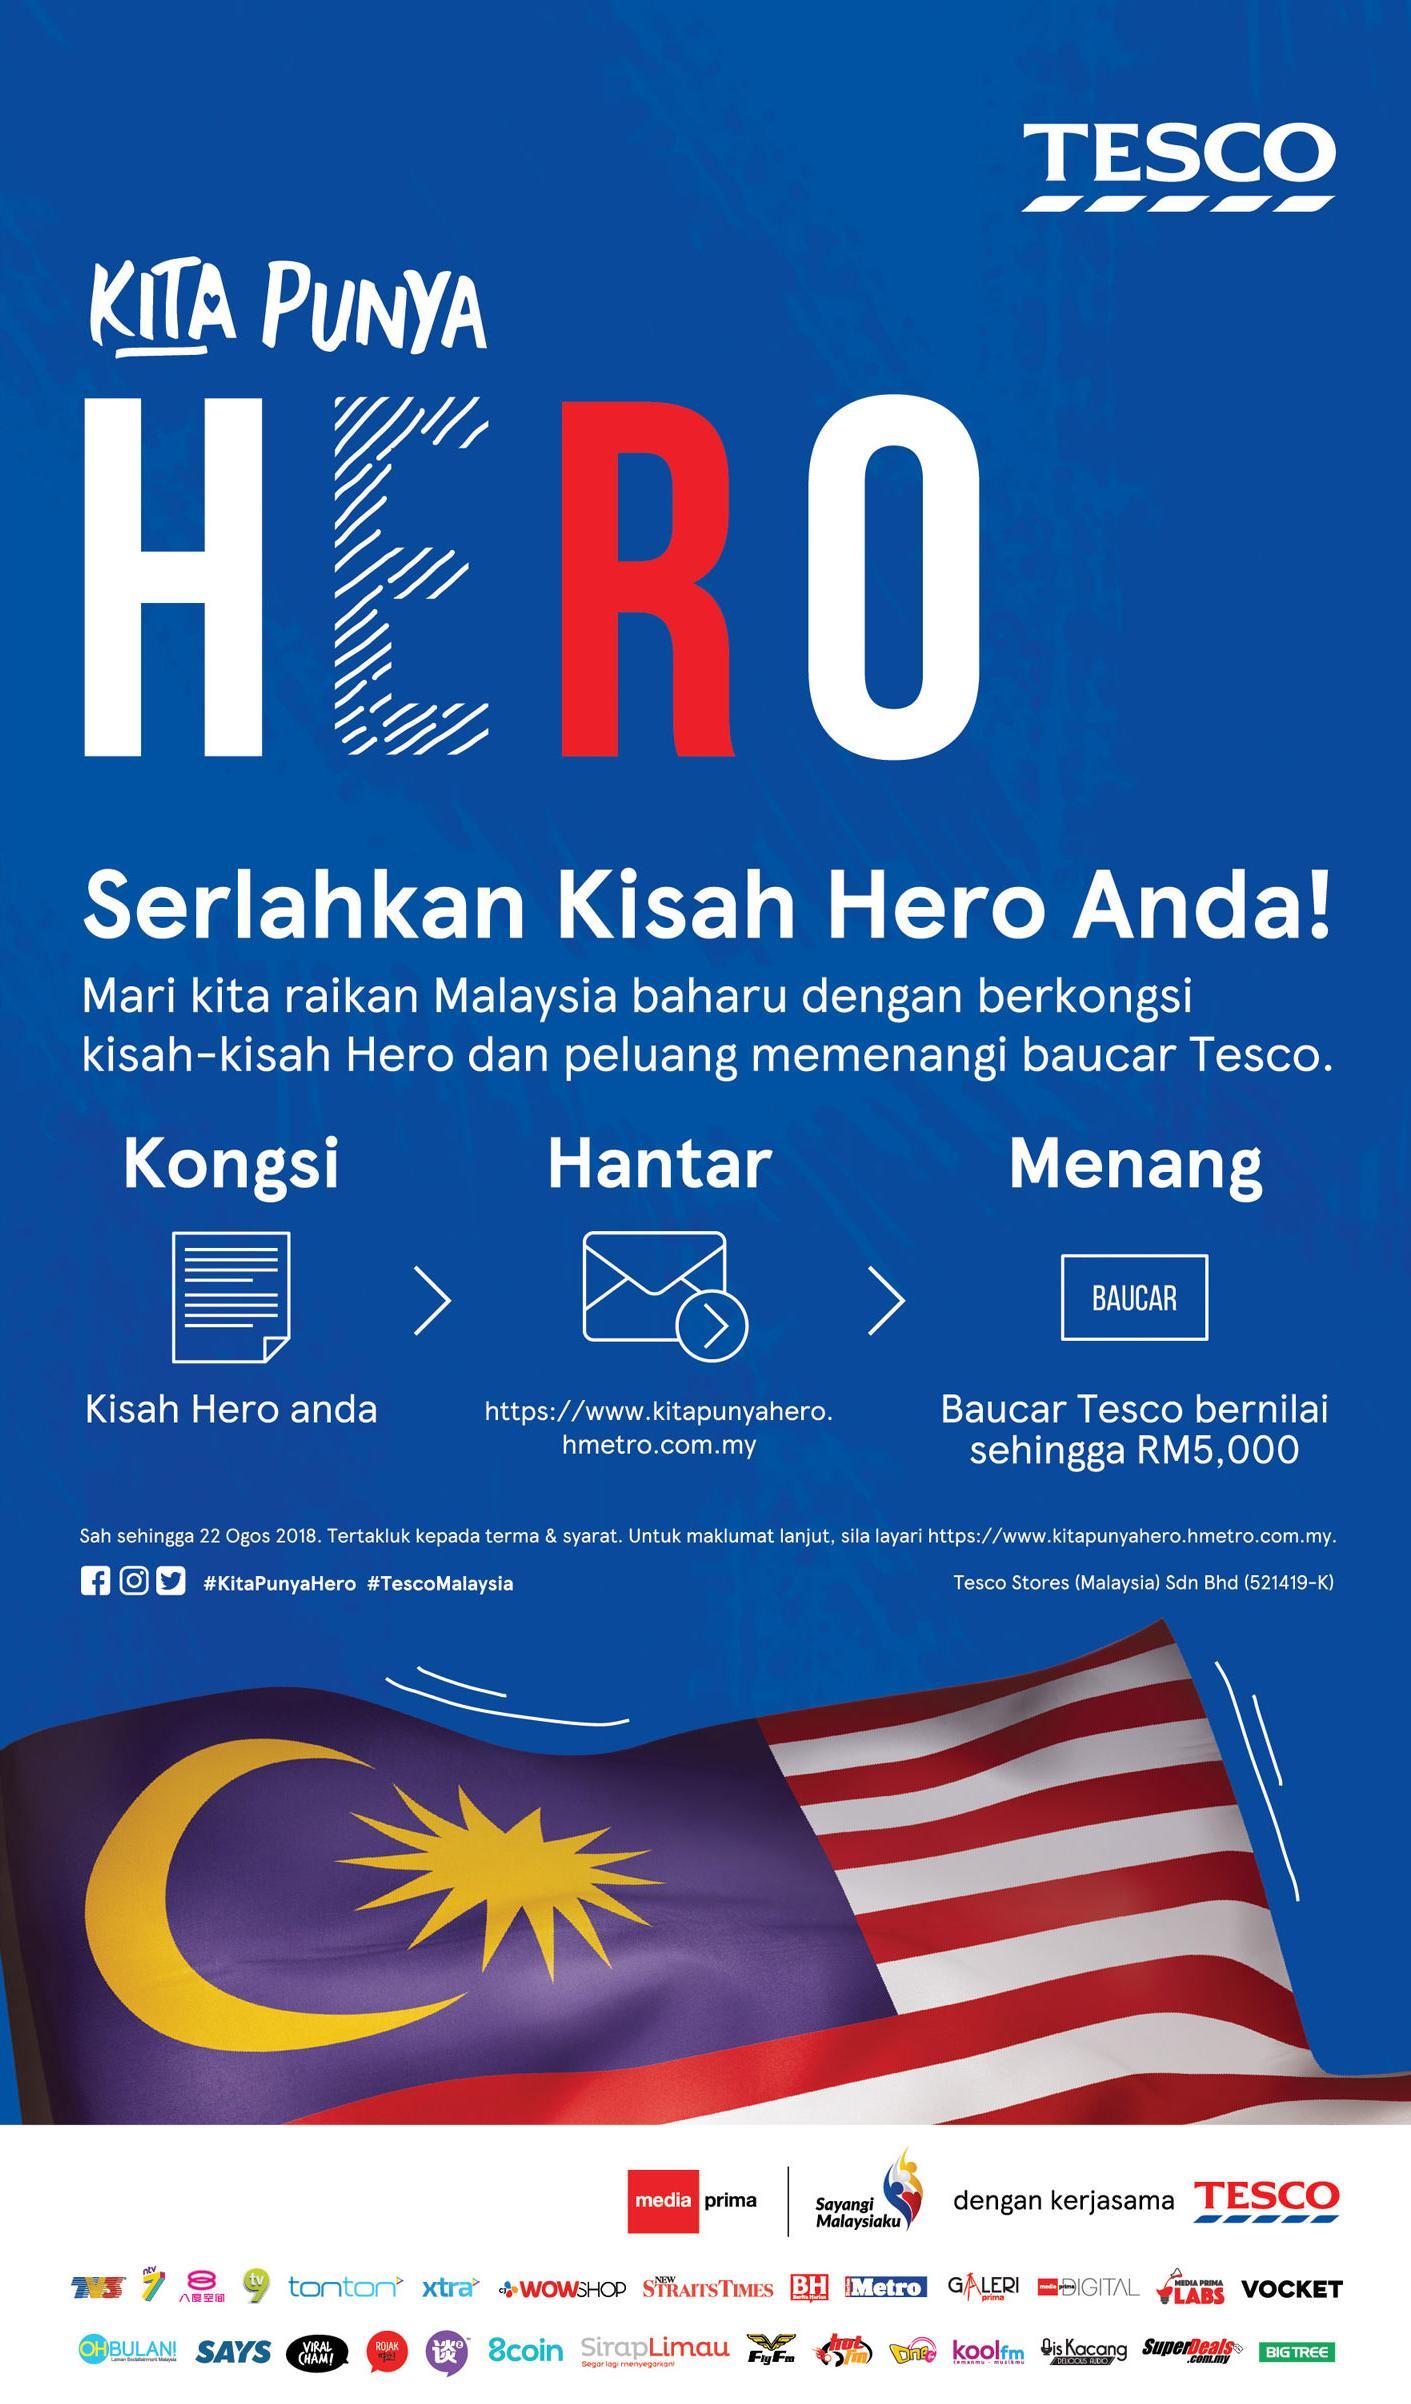 Image from Tesco Malaysia